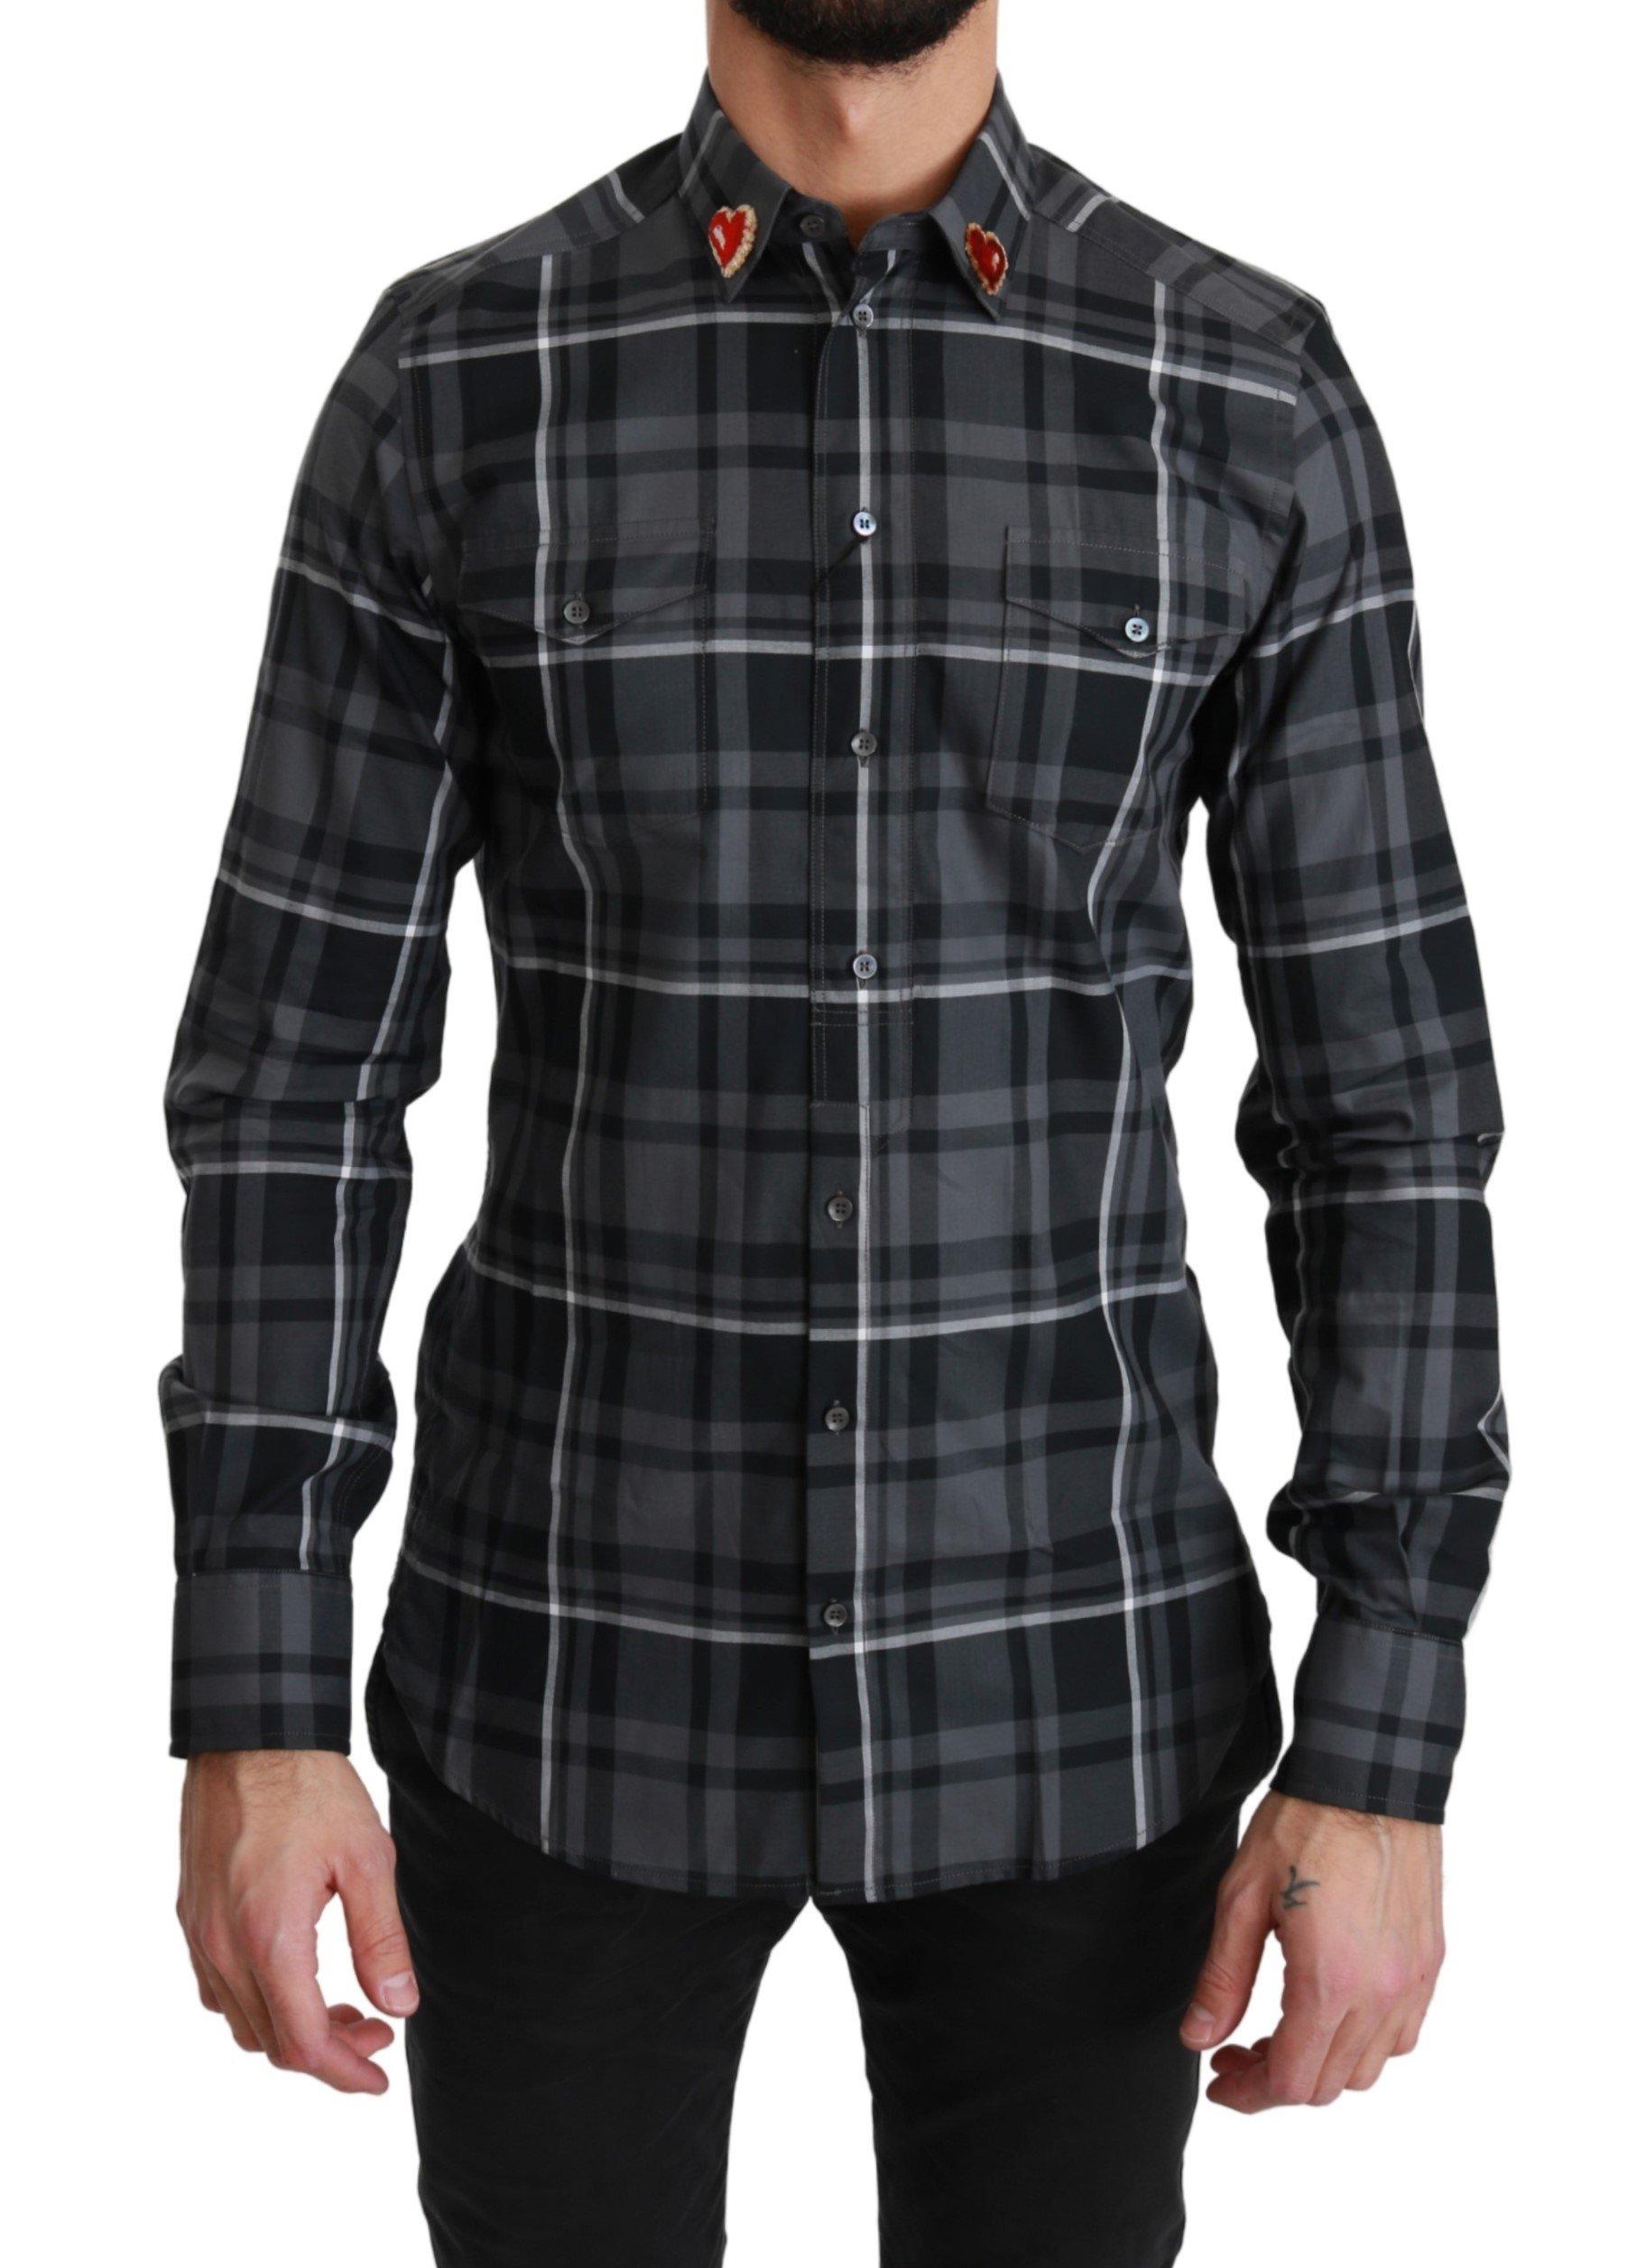 Dolce & Gabbana Men's Checkered Heart Collar MARTINI Shirt Gray TSH4482 - IT37 | XS